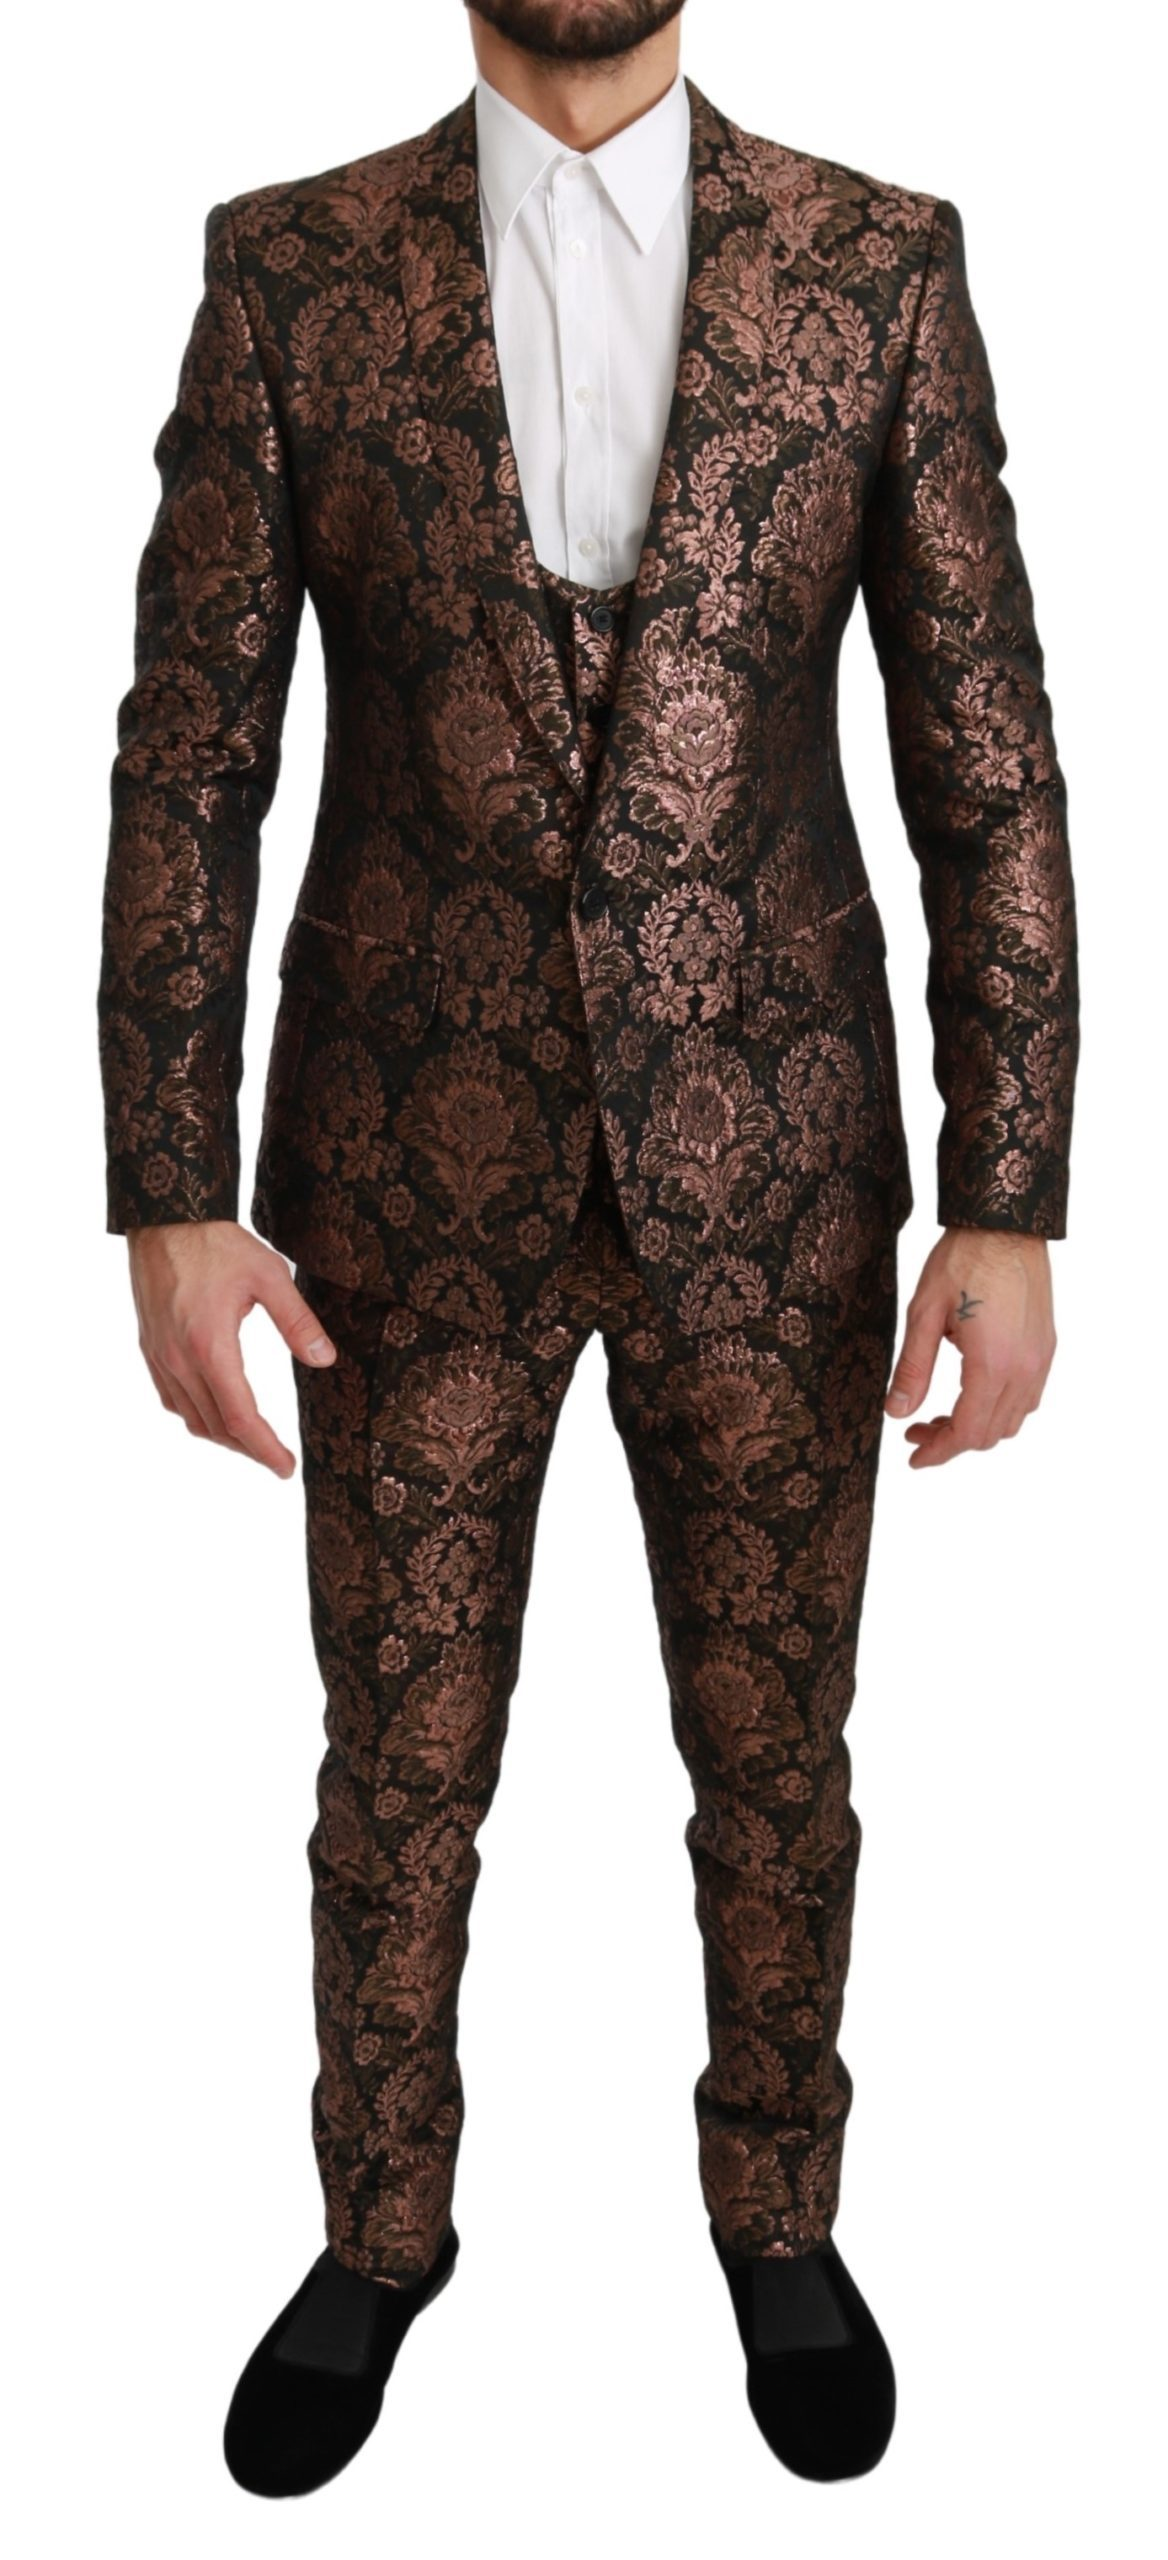 Dolce & Gabbana Men's Jacquard Slim Fit MARTINI Suit Black KOS1703 - IT48 | M